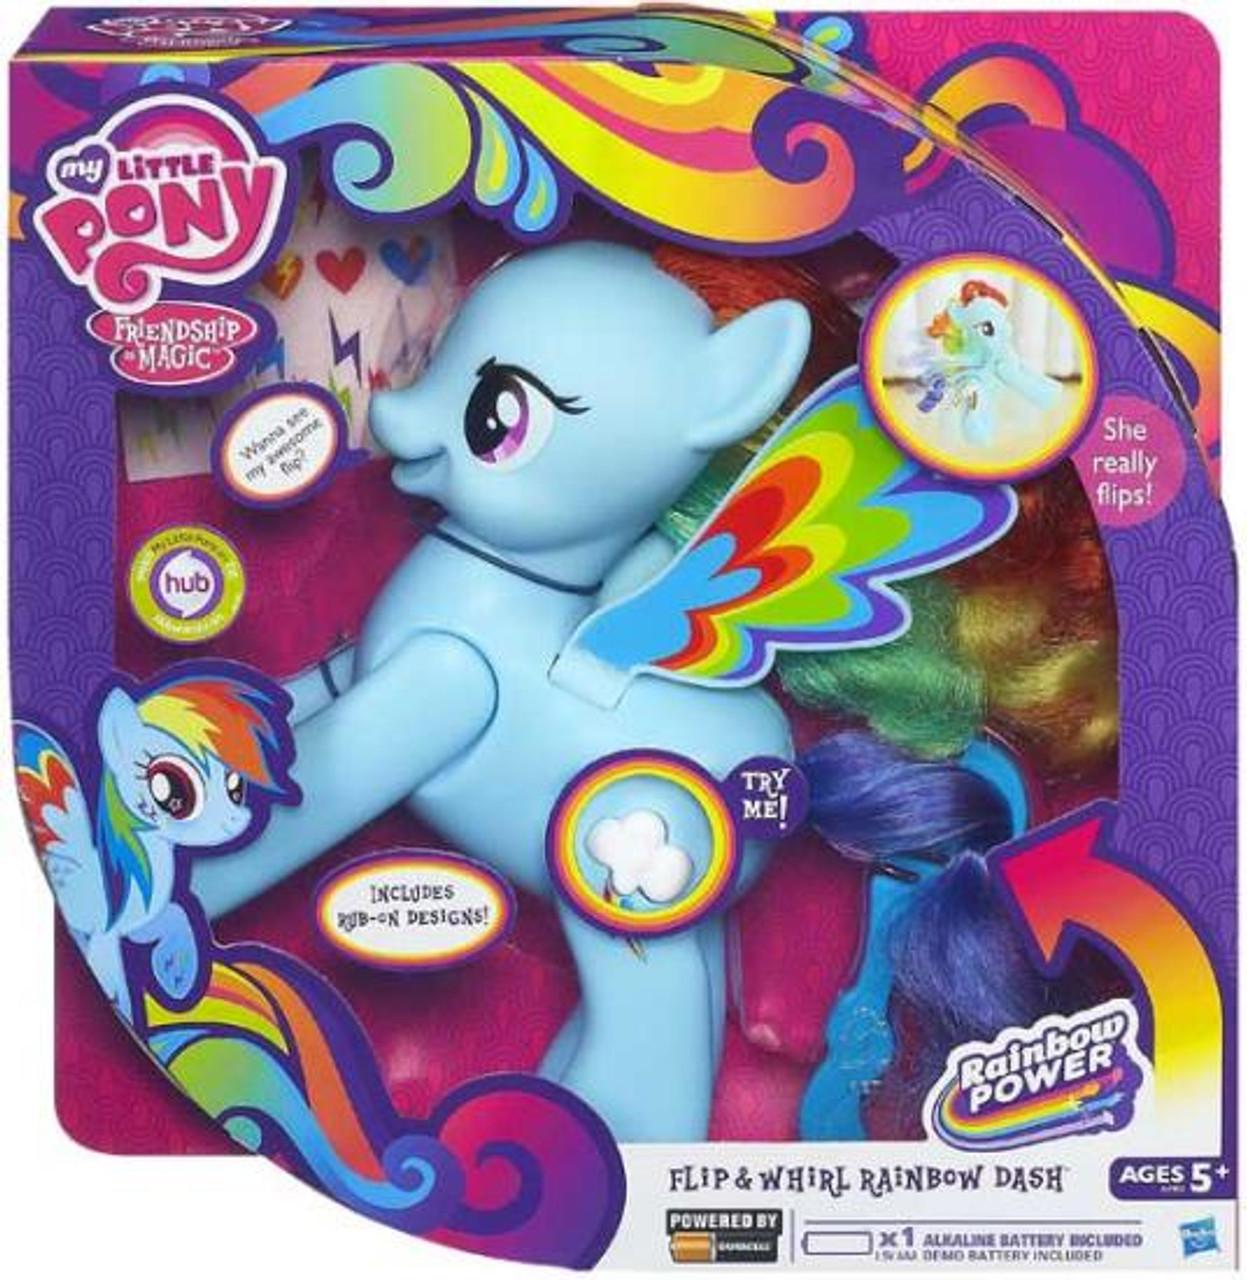 My Little Pony Friendship is Magic Rainbow Power Flip & Whirl Rainbow Dash Figure